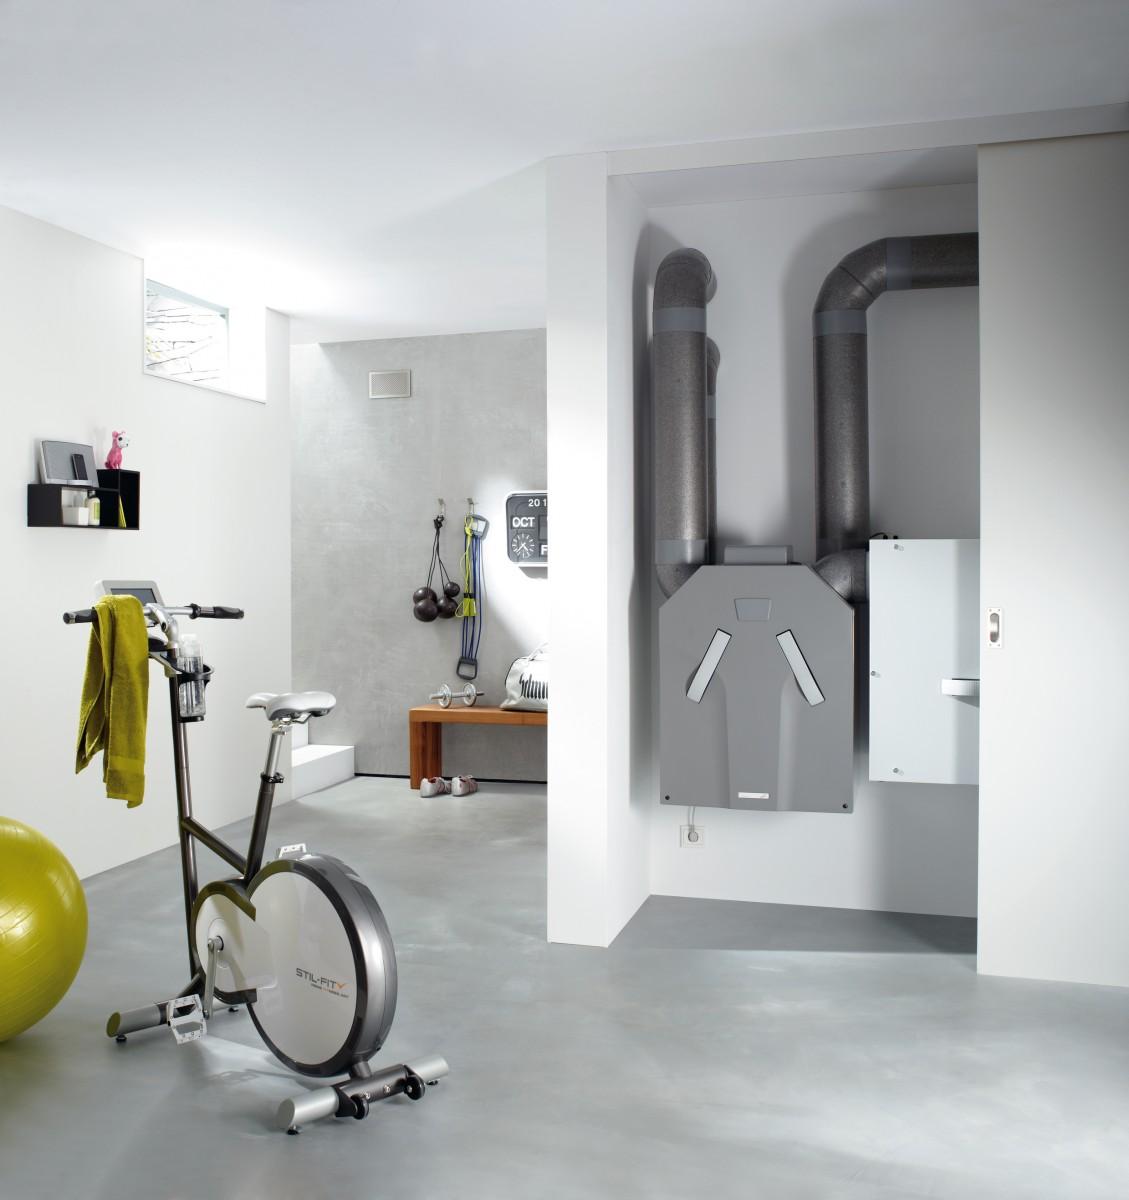 kontrollierte wohnrauml ftung kwl bergmann franz. Black Bedroom Furniture Sets. Home Design Ideas